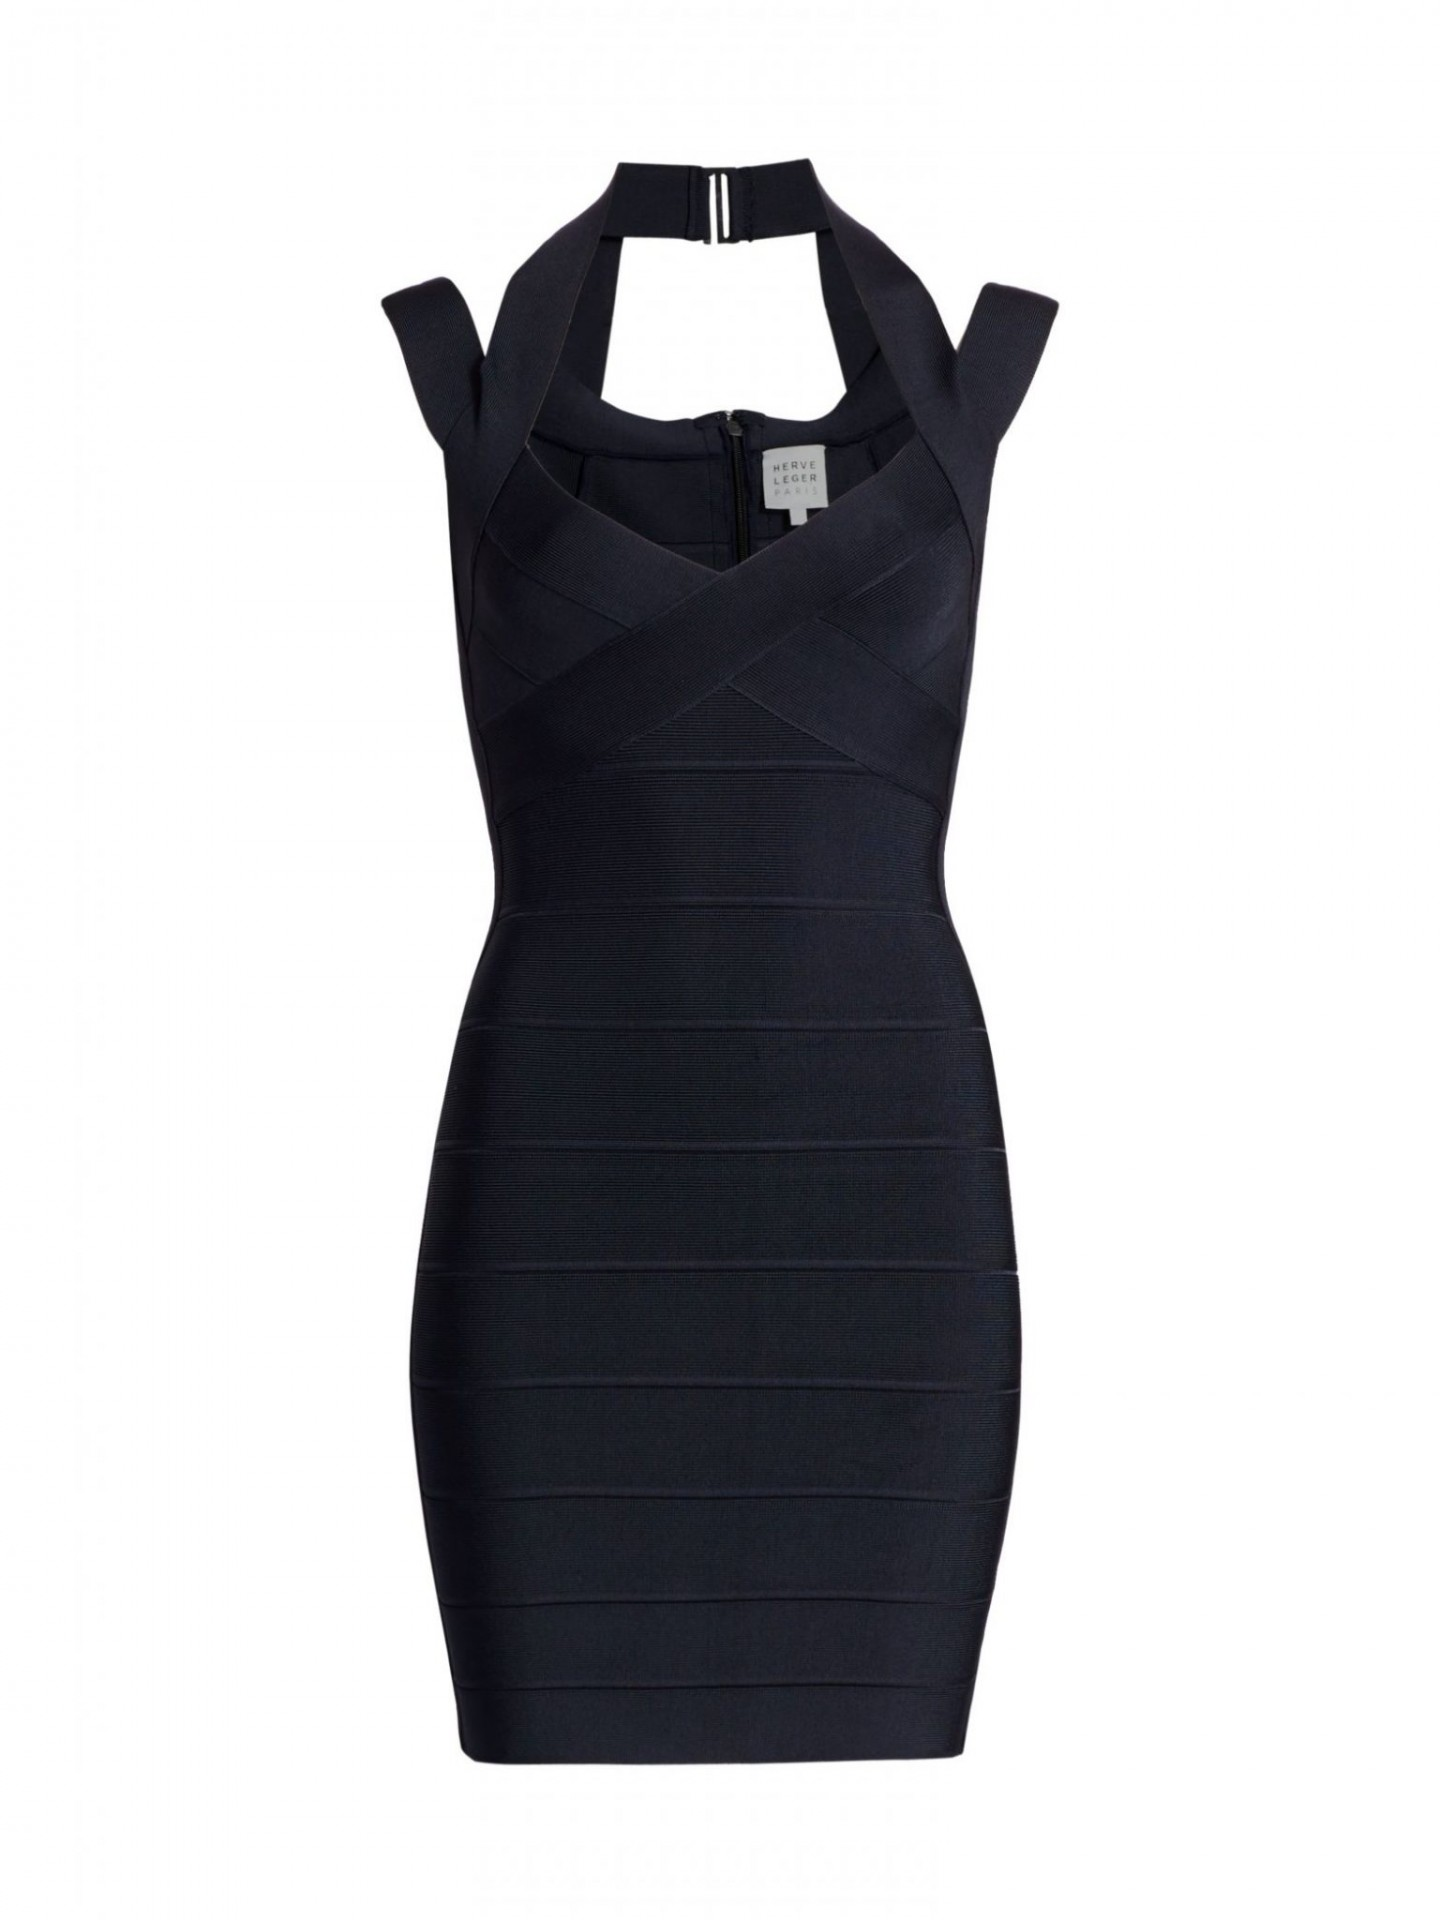 HERVE LEGER Icon Halter Mini Dress